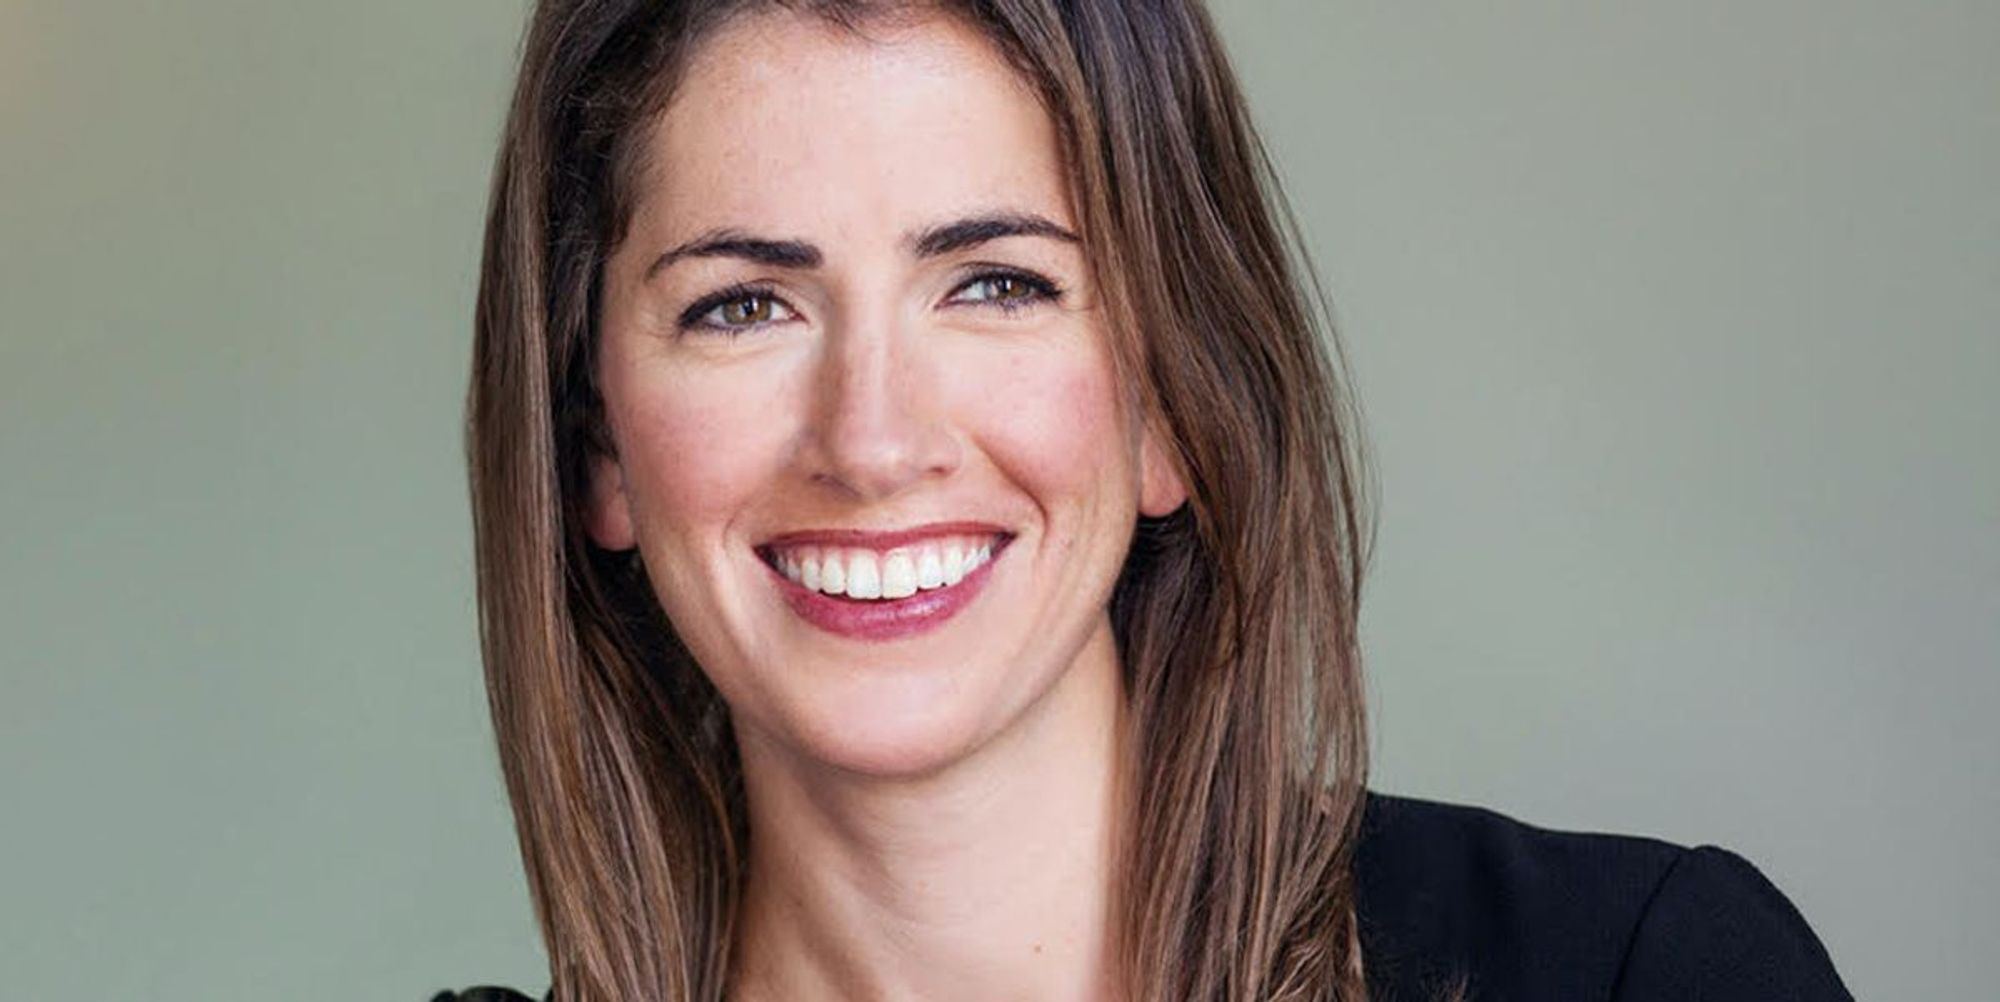 Niantic COO Megan Quinn thinks consumer AR glasses are just around the corner